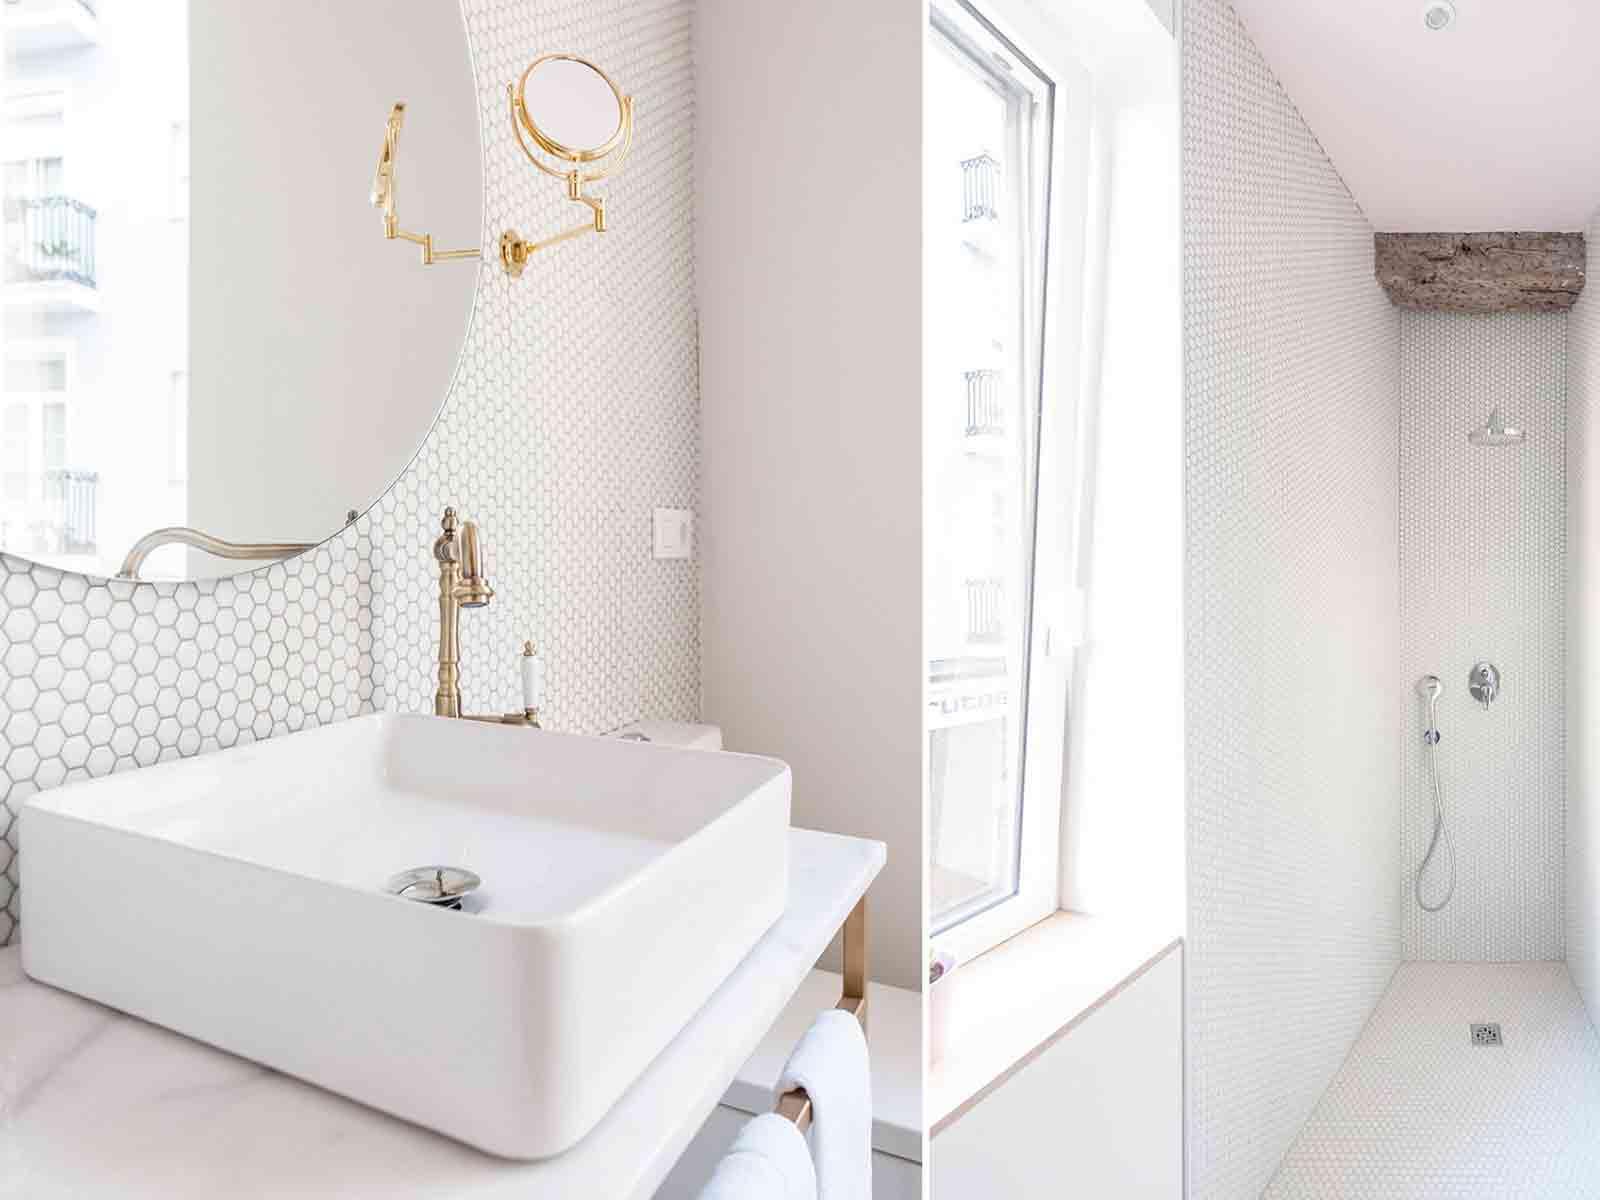 observatorio-baño-cocina-ambiente-bathco